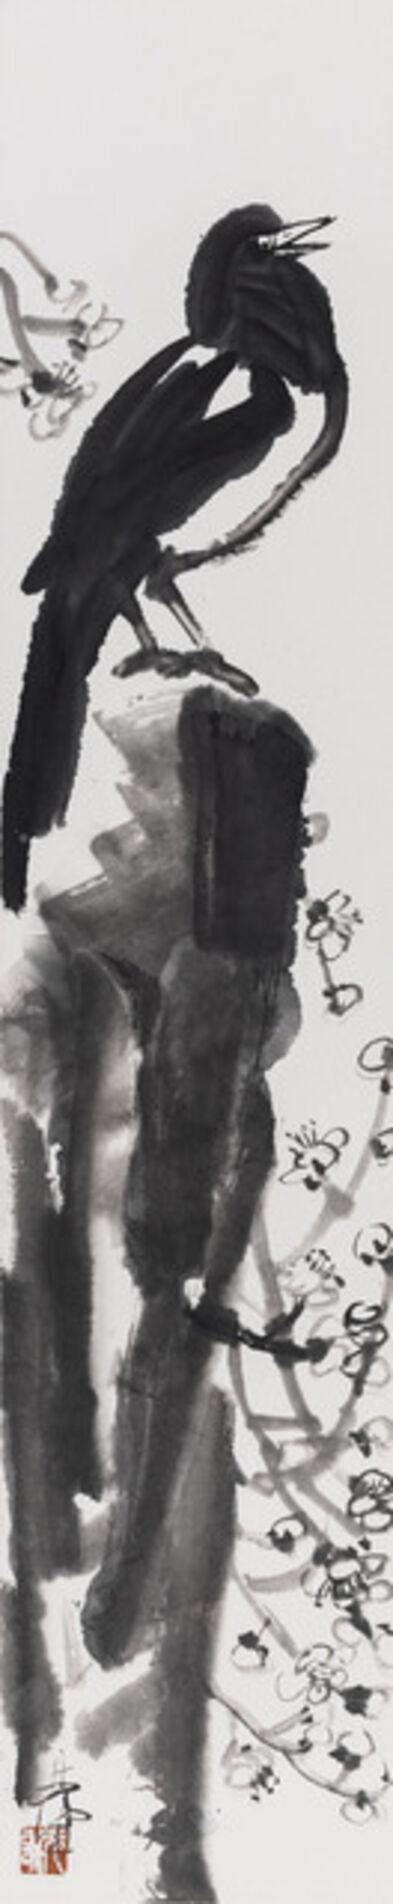 Peng Xiancheng, 'Frolicking Magpie Among Plum Blossoms', 2012